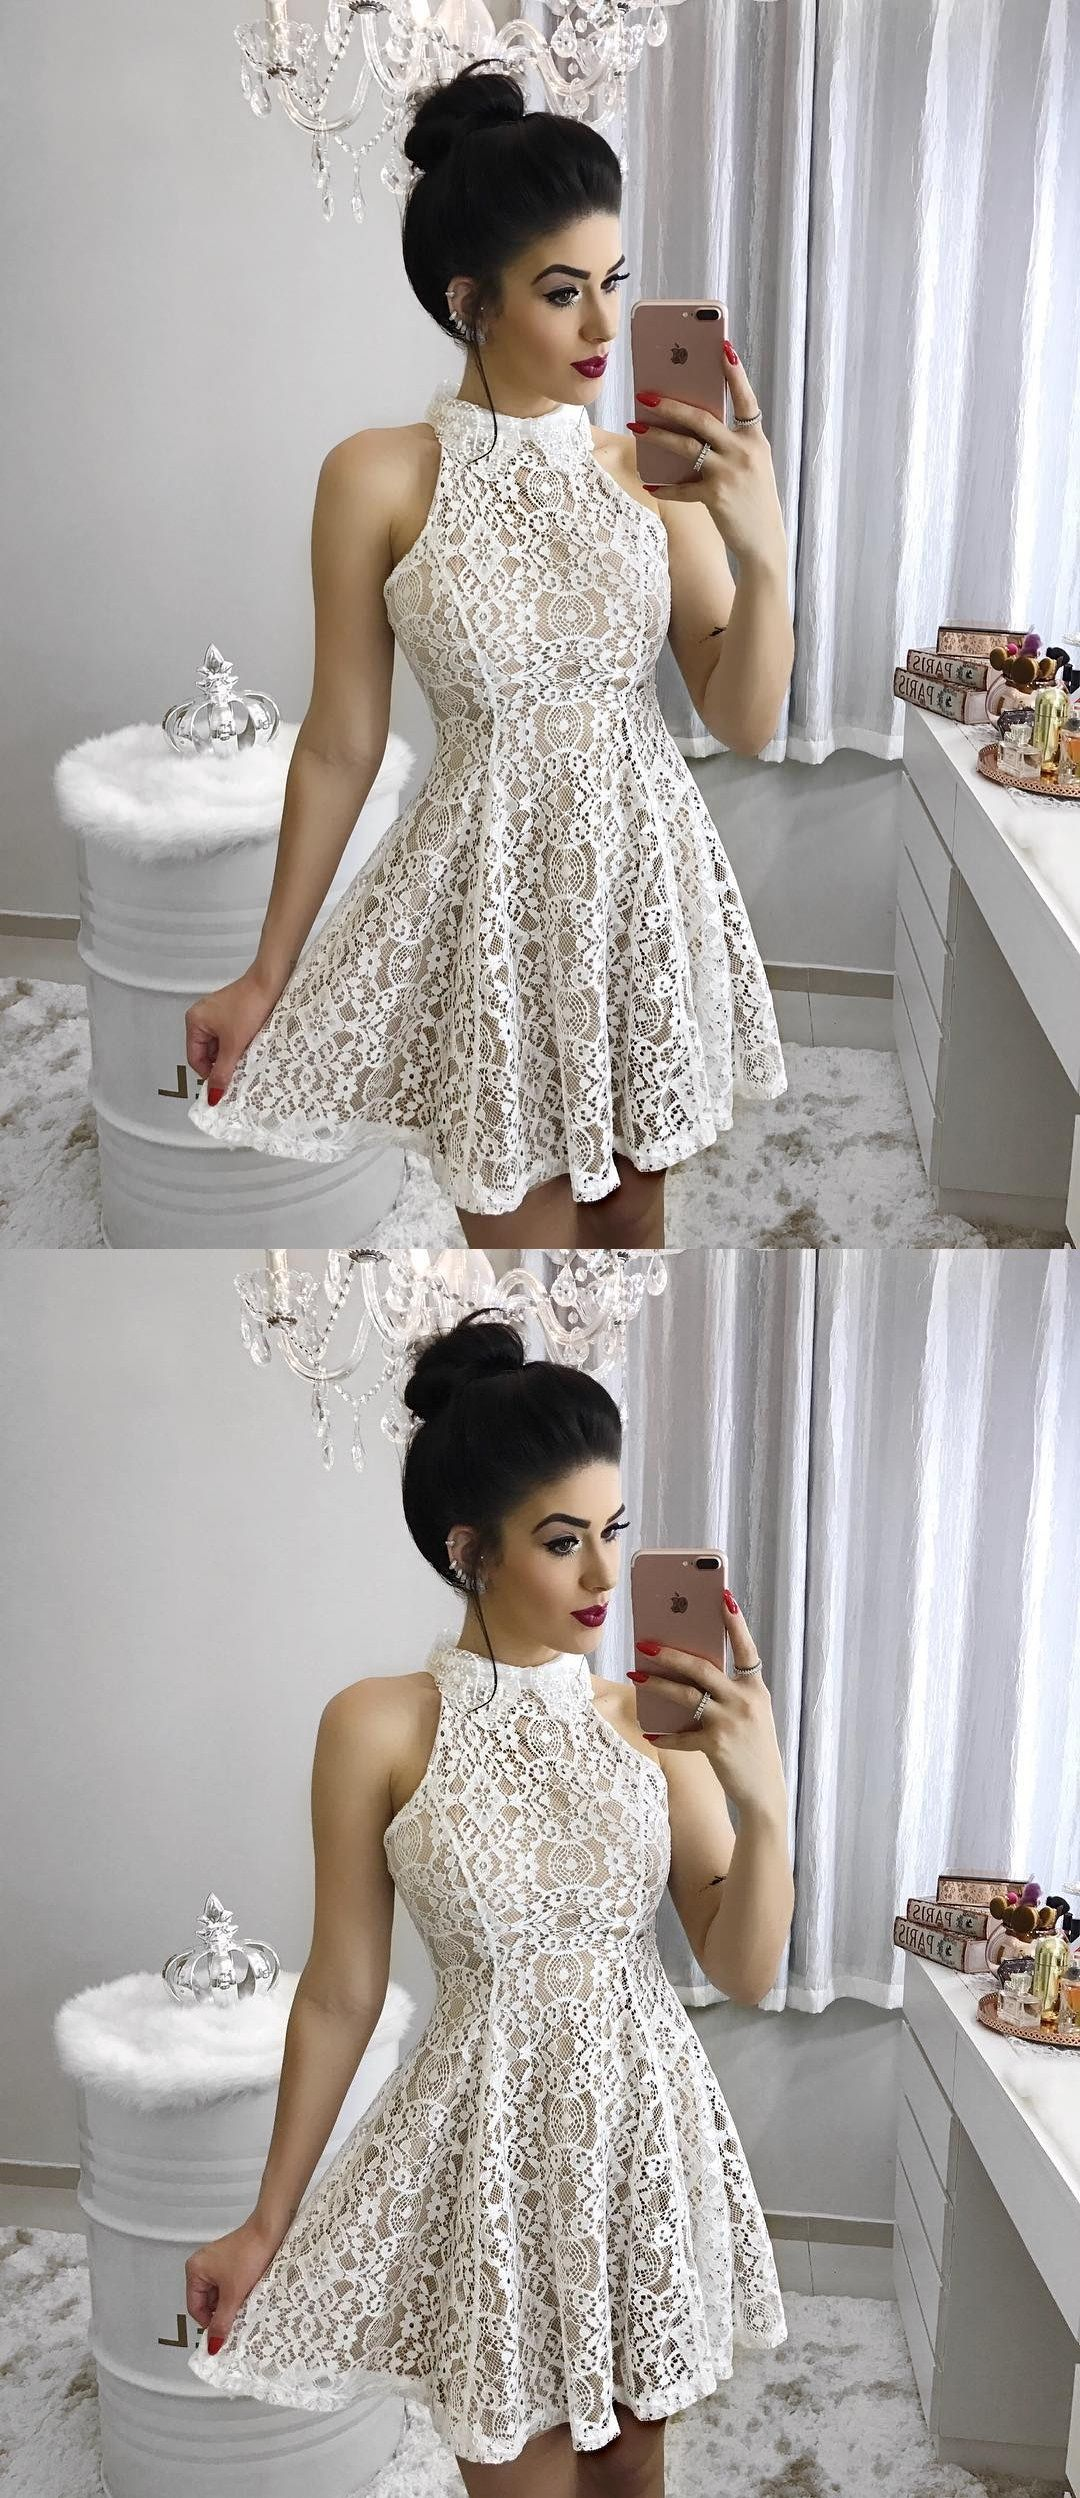 Aline high neck short sleeveless ivory lace homecoming dress lace